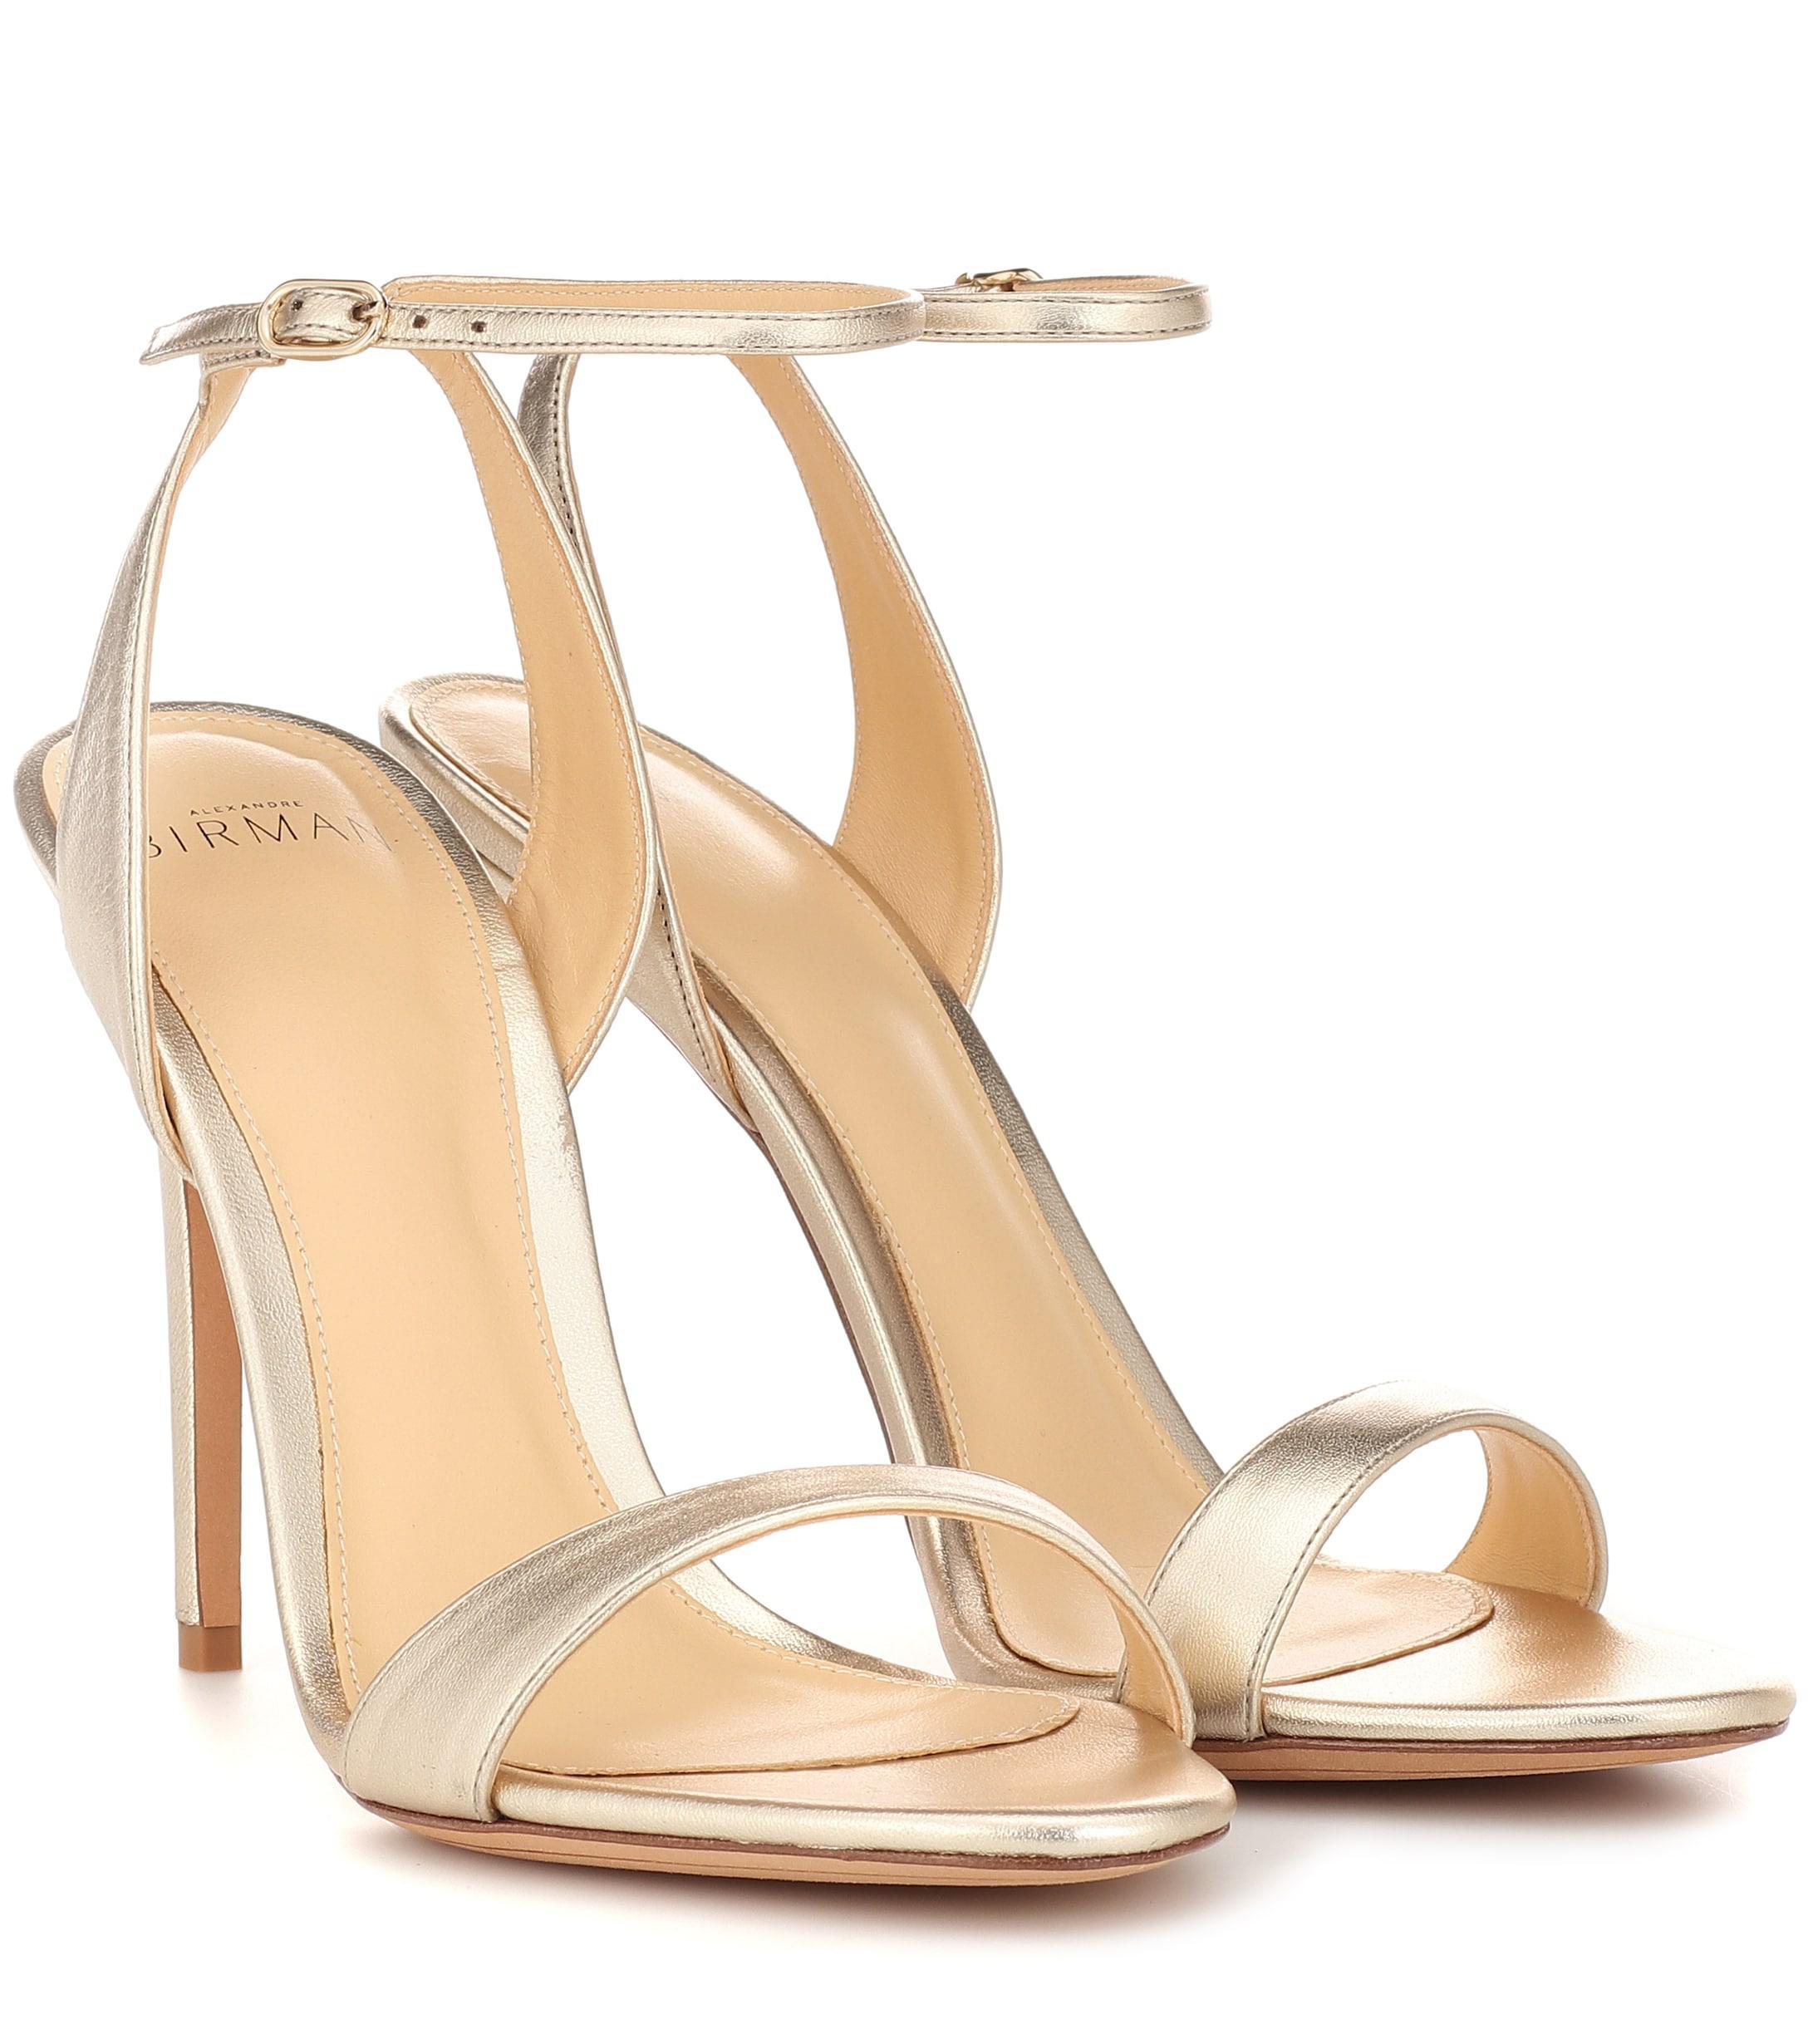 Alexandre Birman Santine 100 Leather Sandals - Lyst